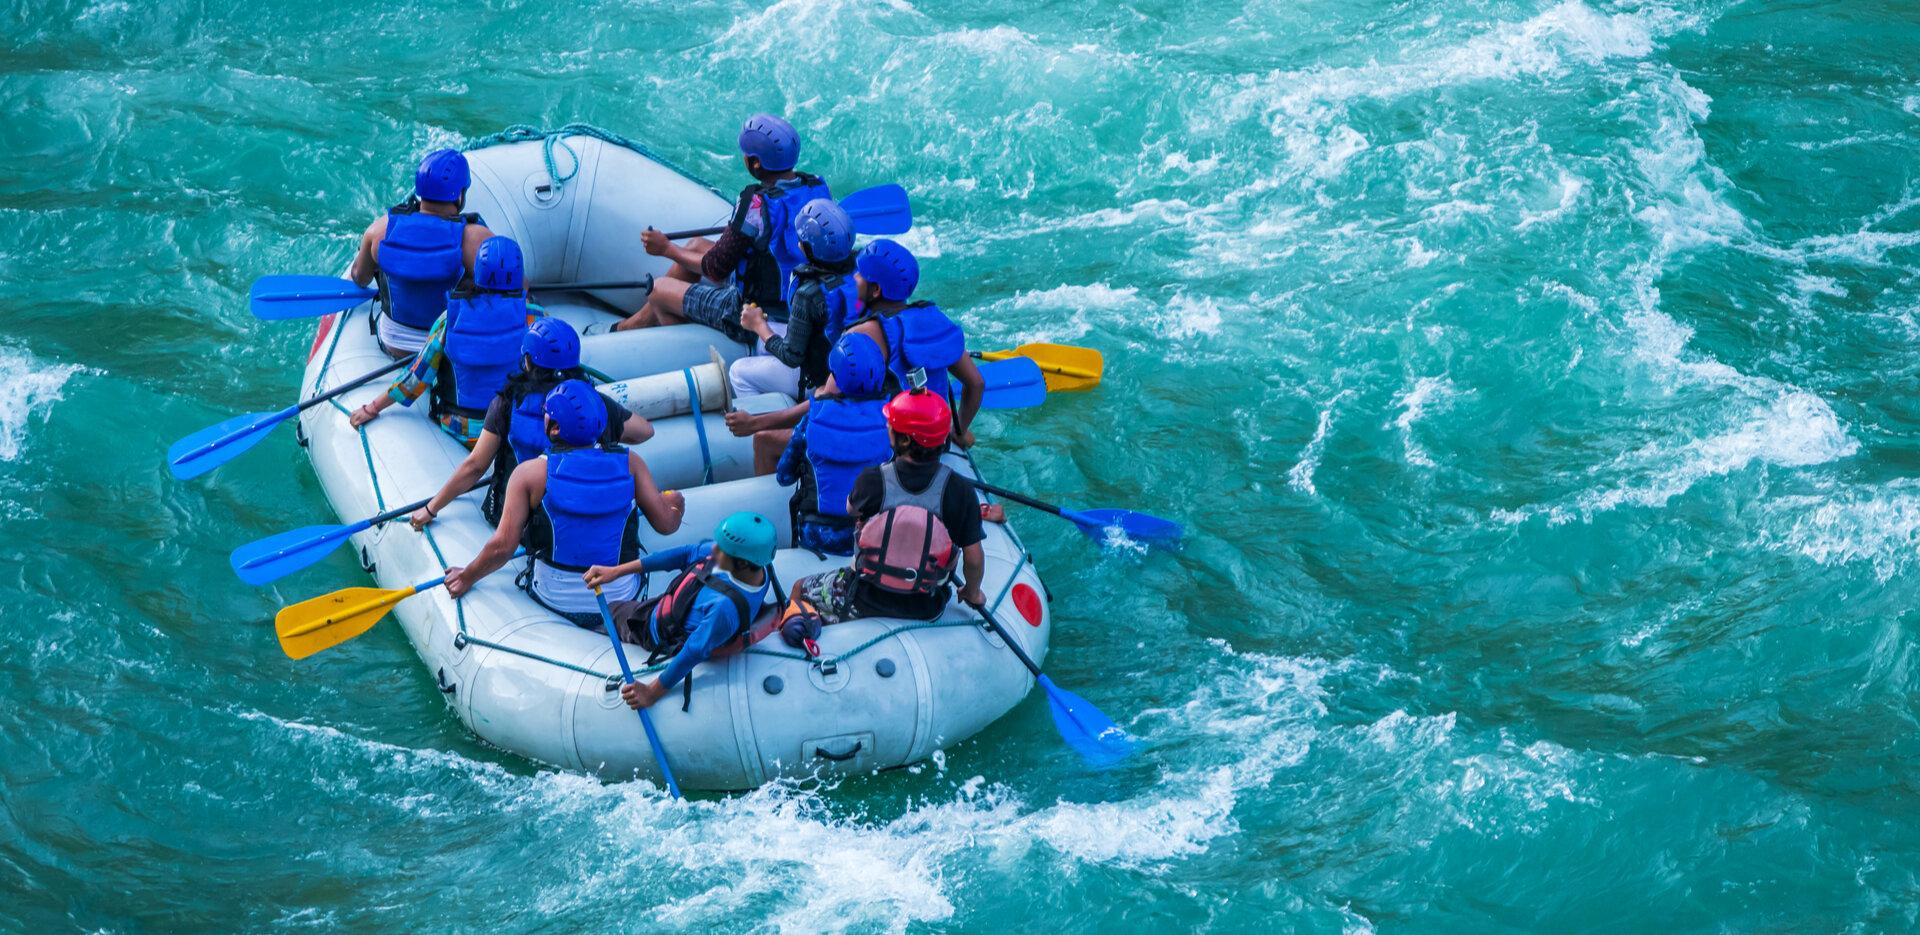 Adventure Activities in the Monsoons